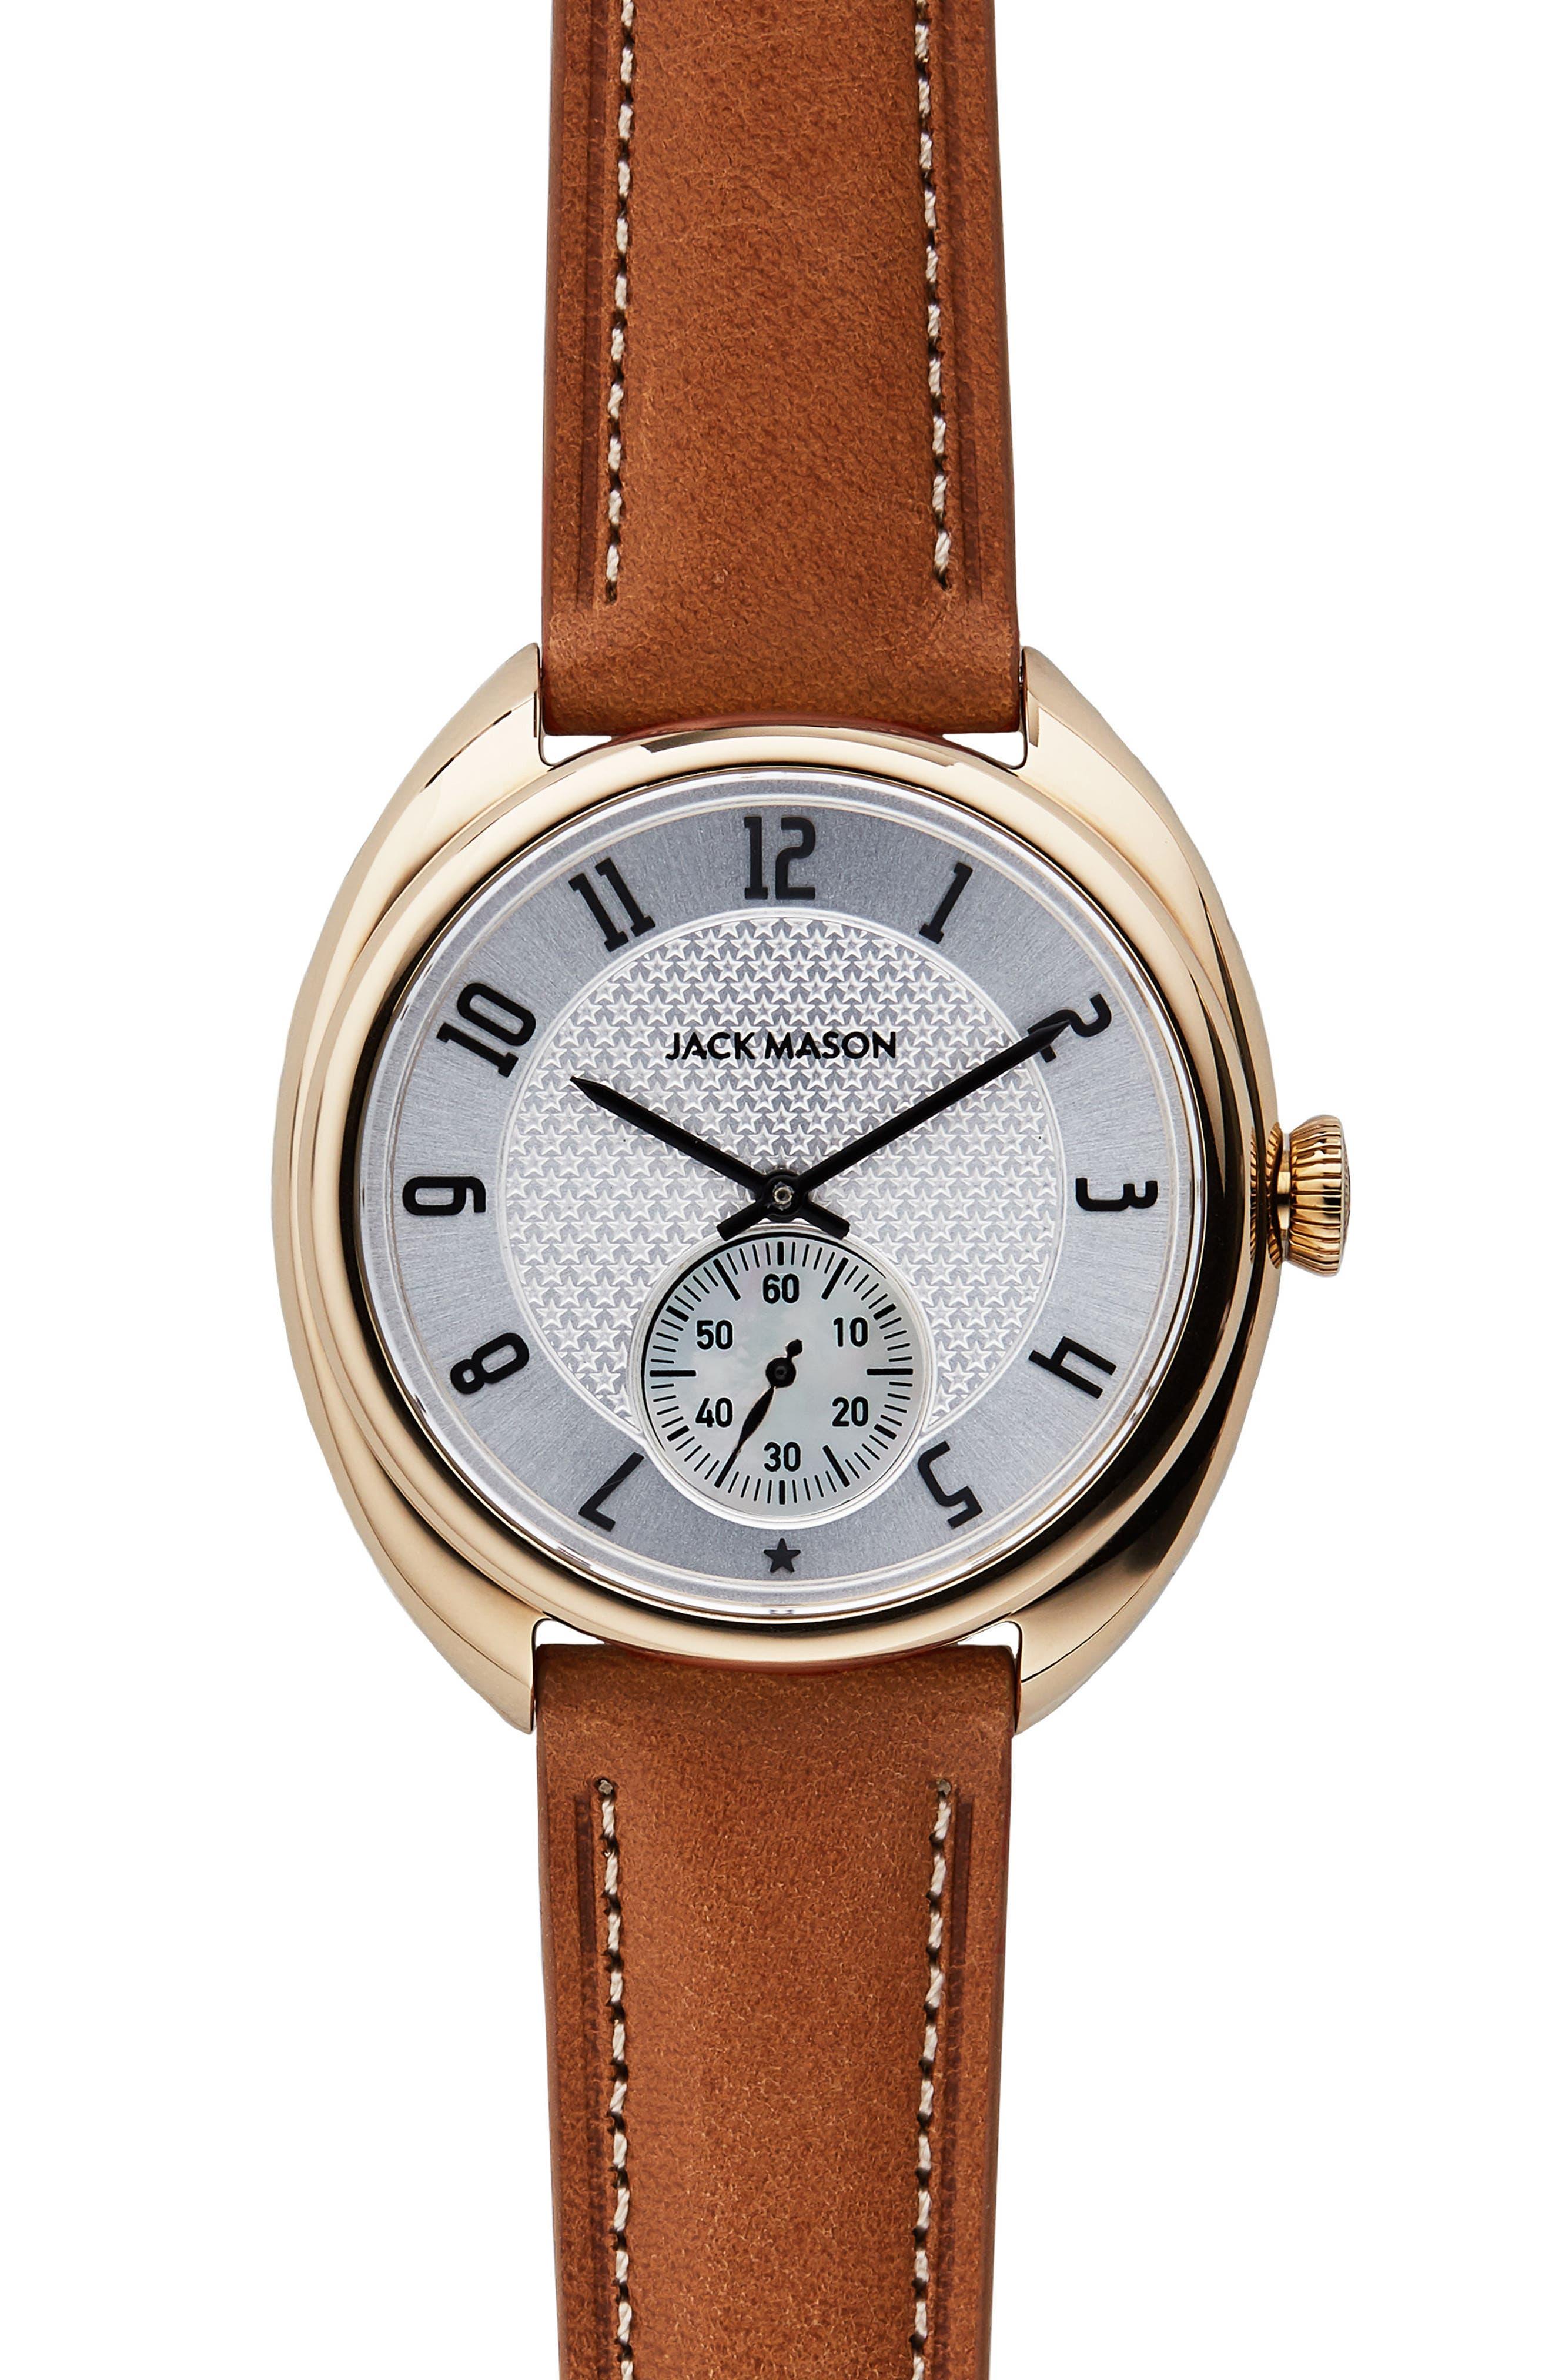 Main Image - Jack Mason Issue No. 1 Leather Strap Watch, 41mm